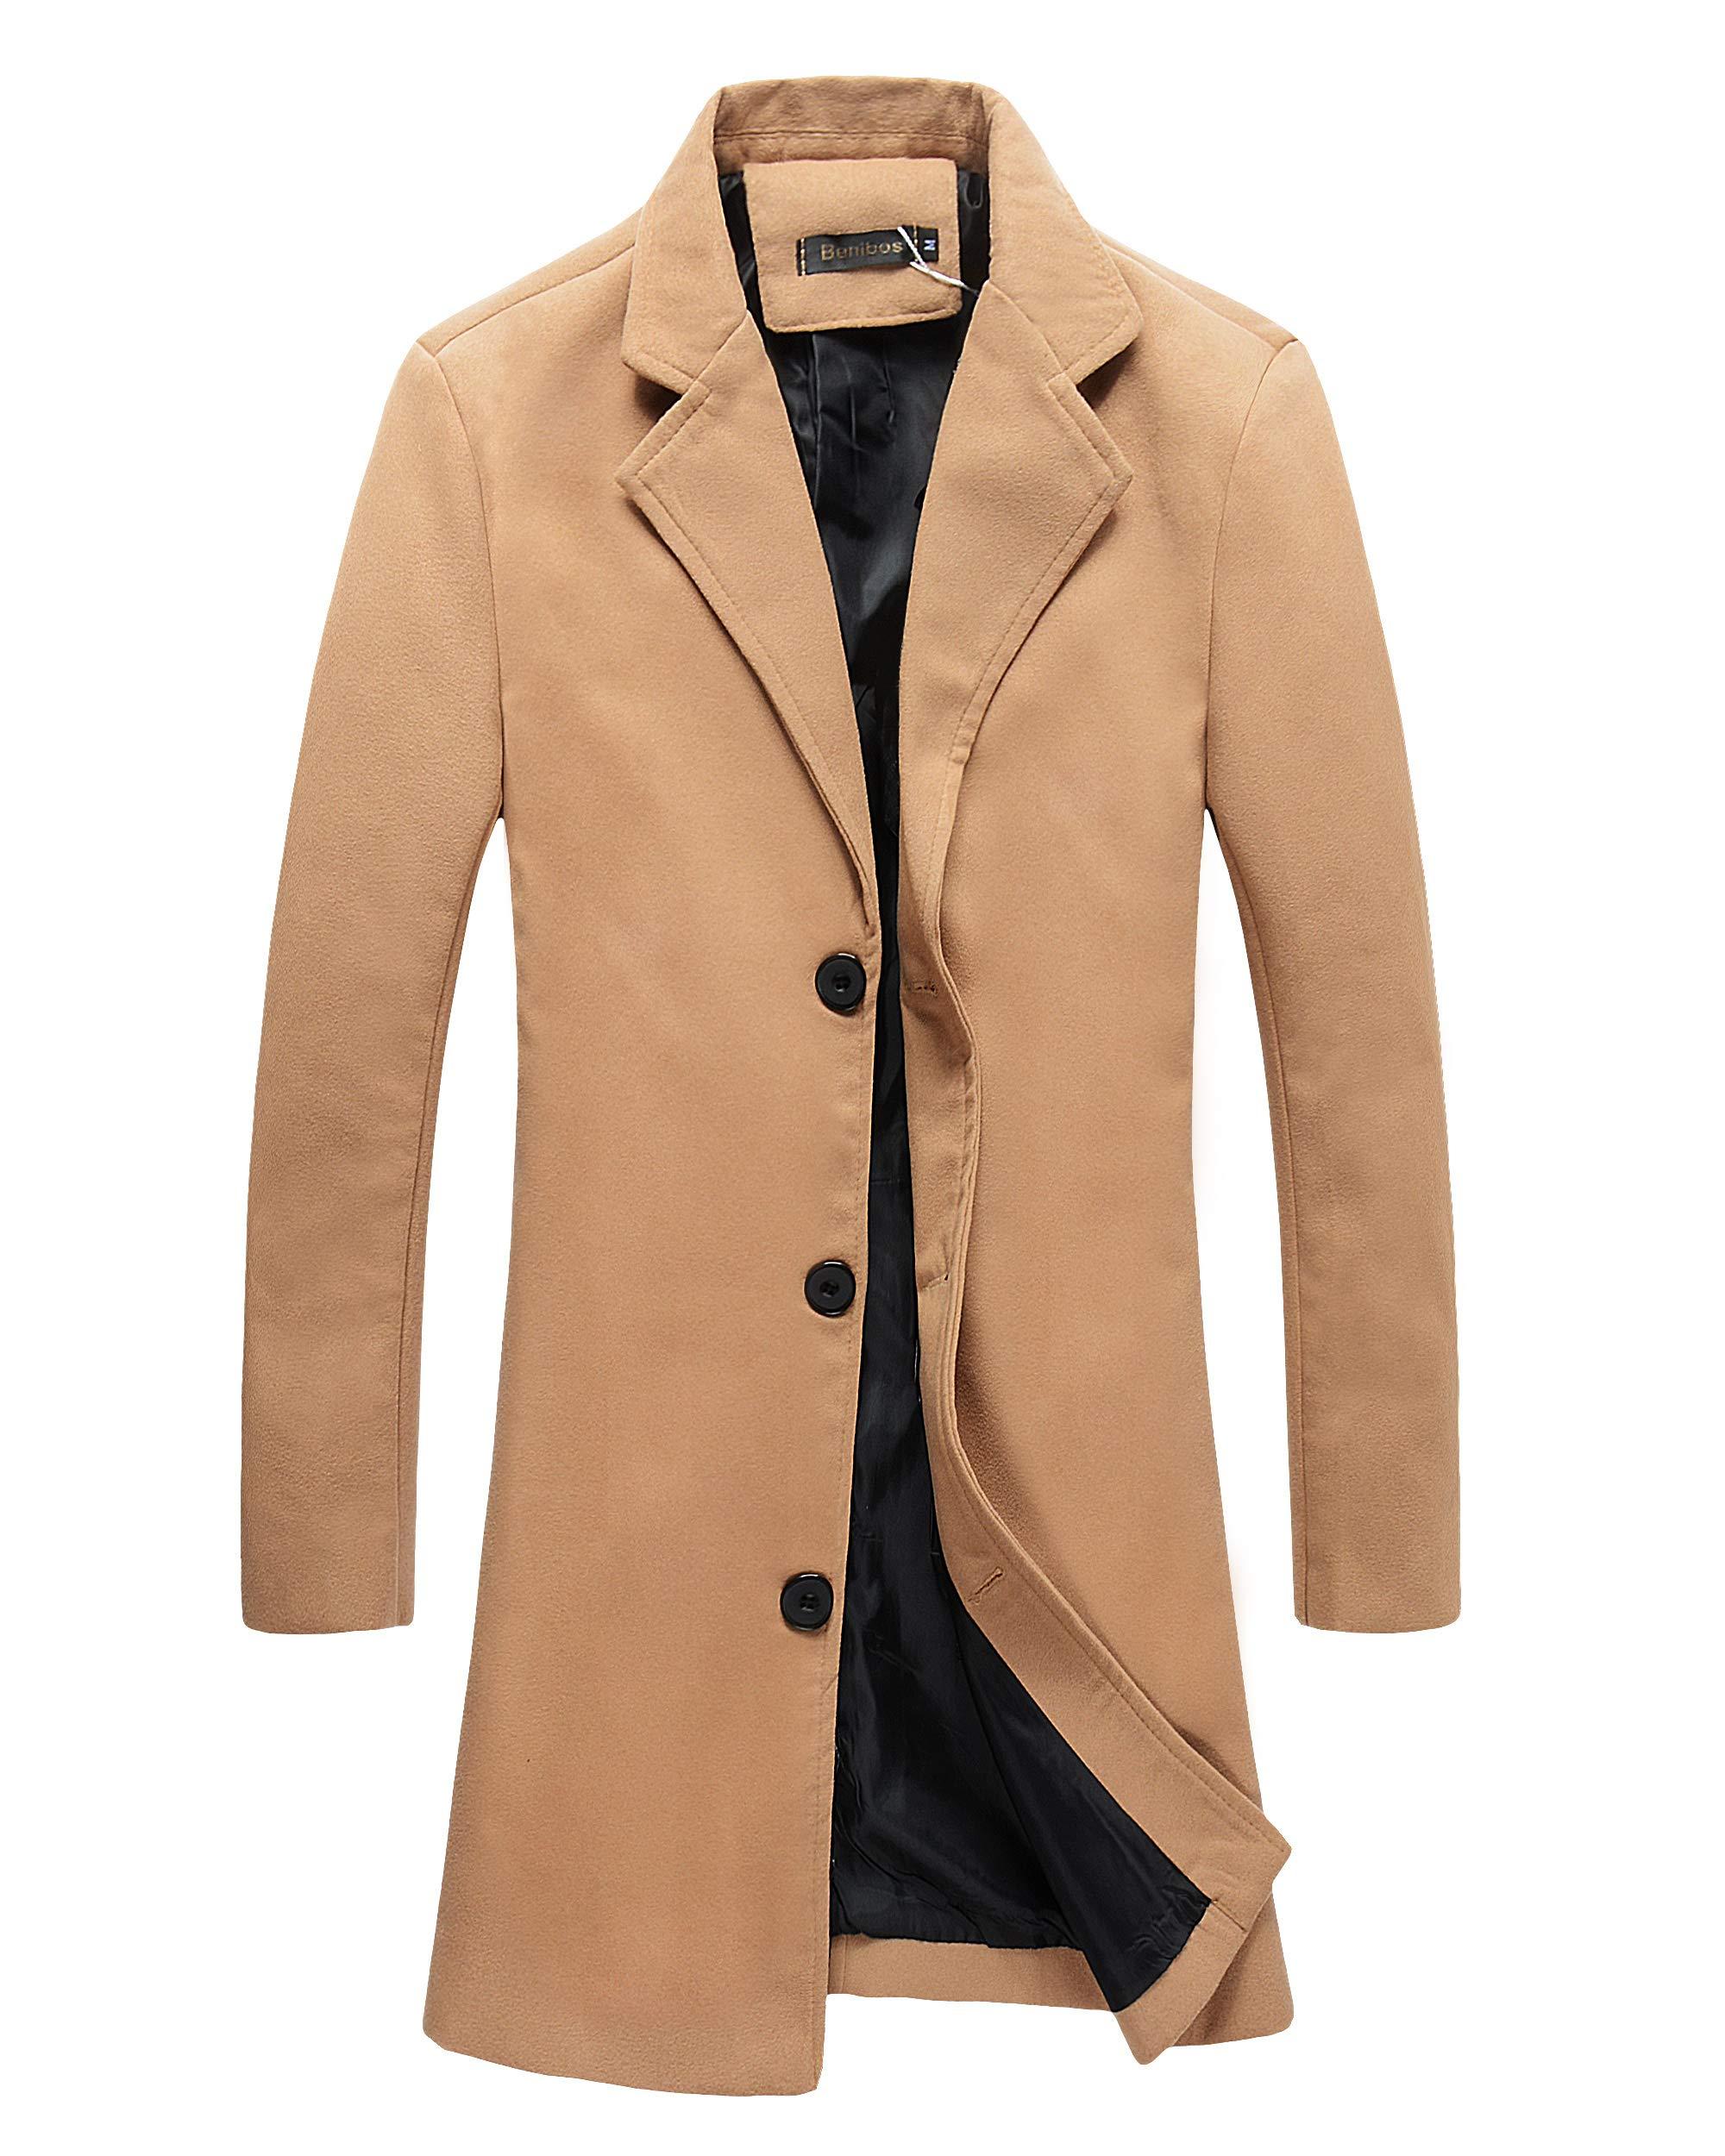 Beninos Mens Trench Coat Slim Fit Notched Collar Overcoat (L, F20 Camel) by Beninos